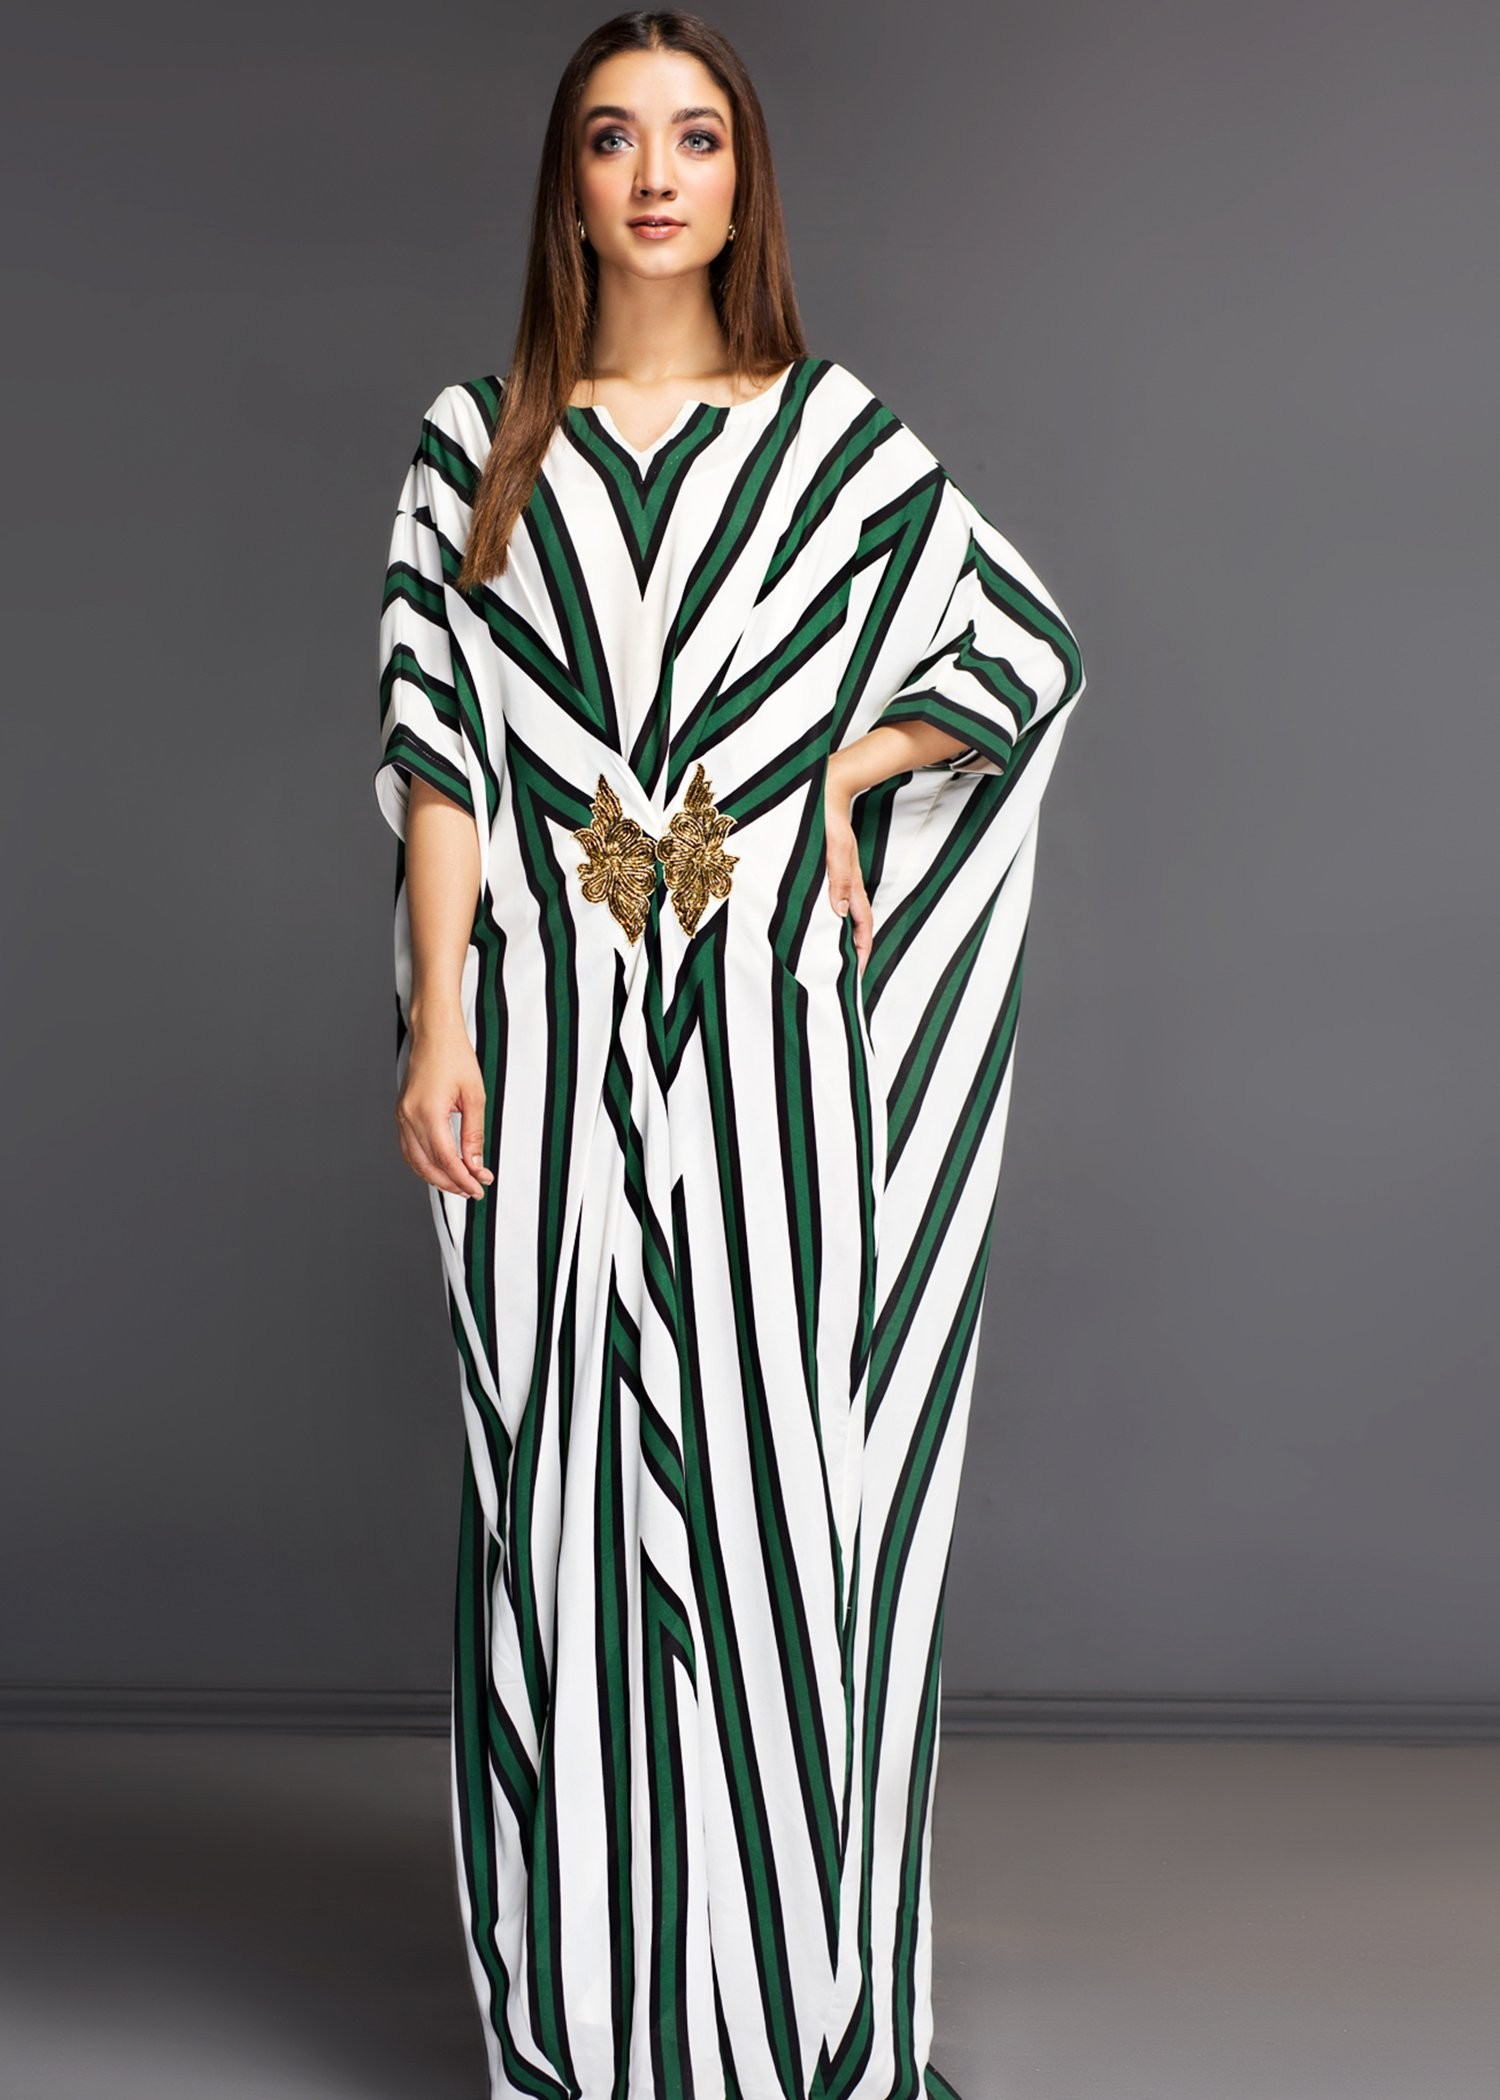 Tokyo-luxury dress